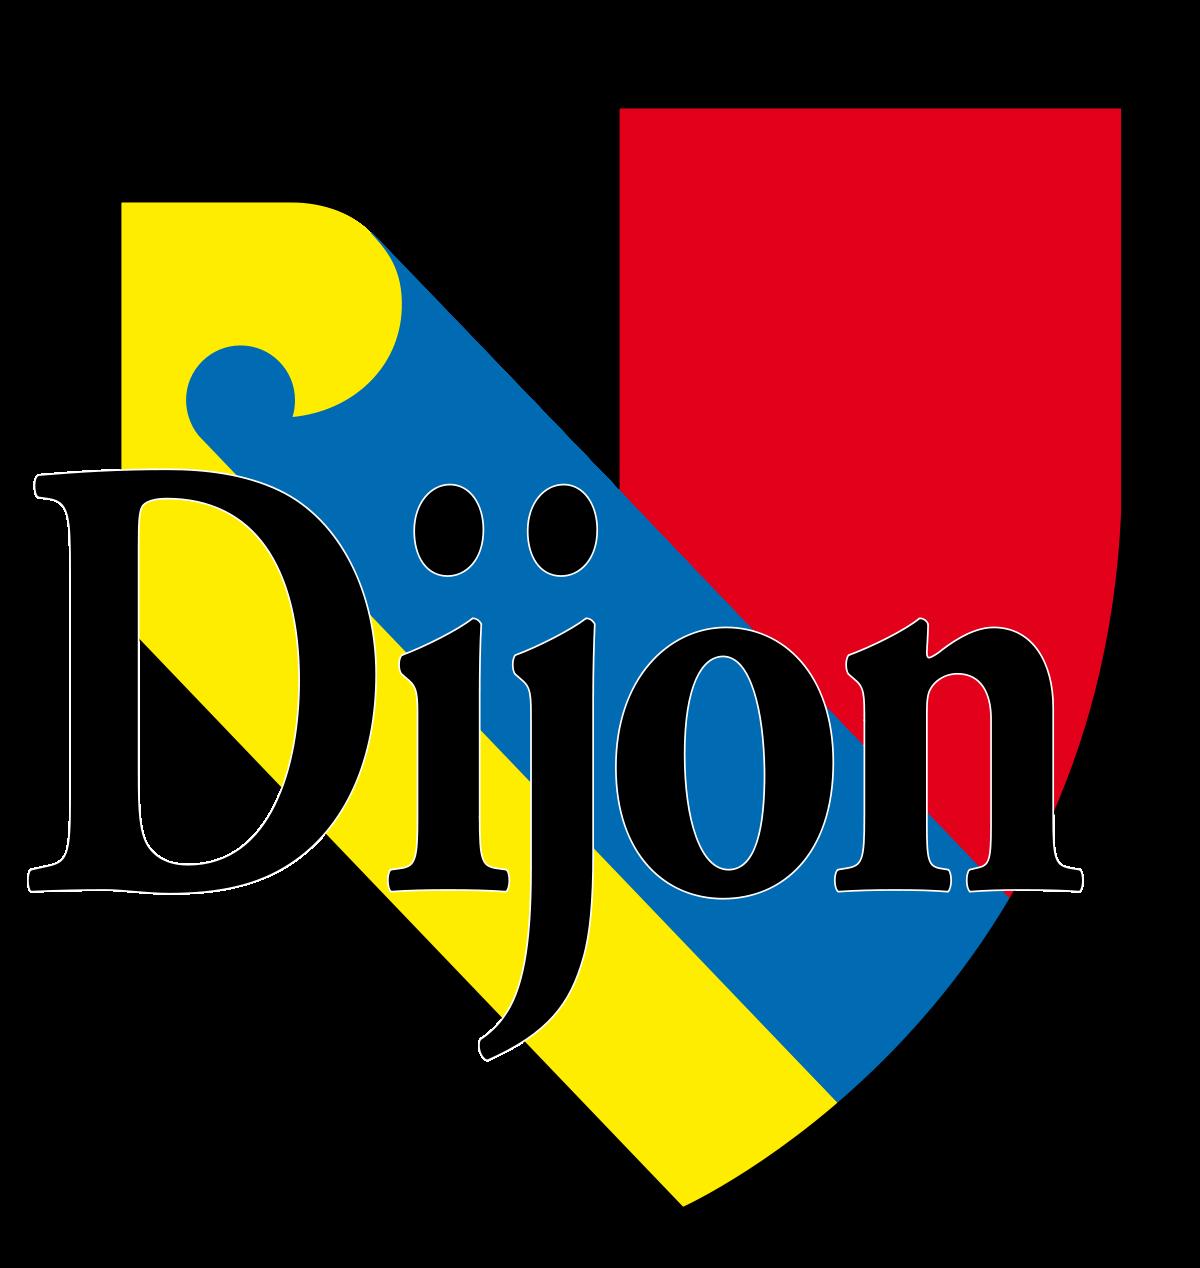 3. DIJON CITY